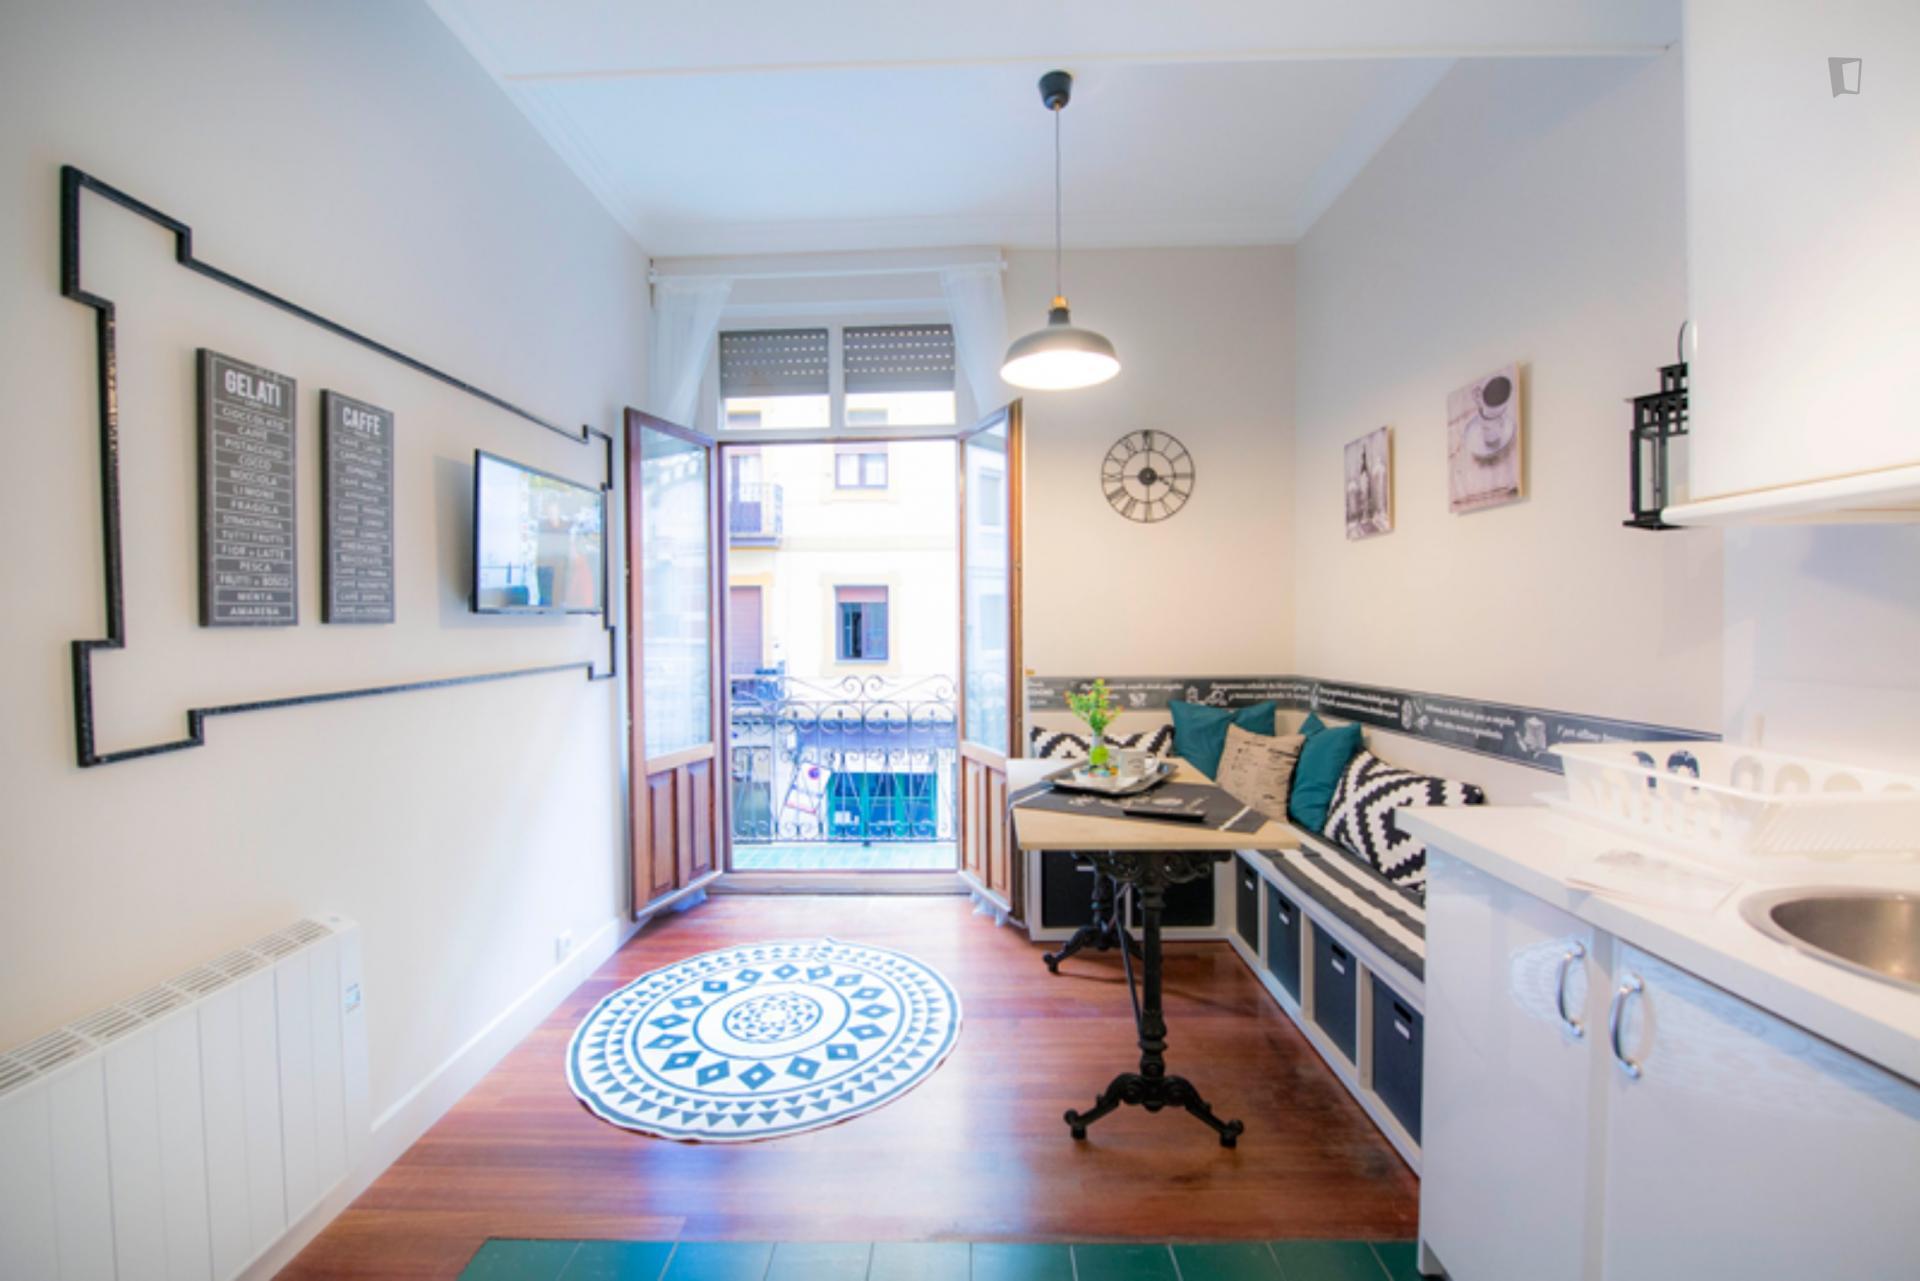 Kalea 17 - Apartamento bellamente ubicado en Bilbao